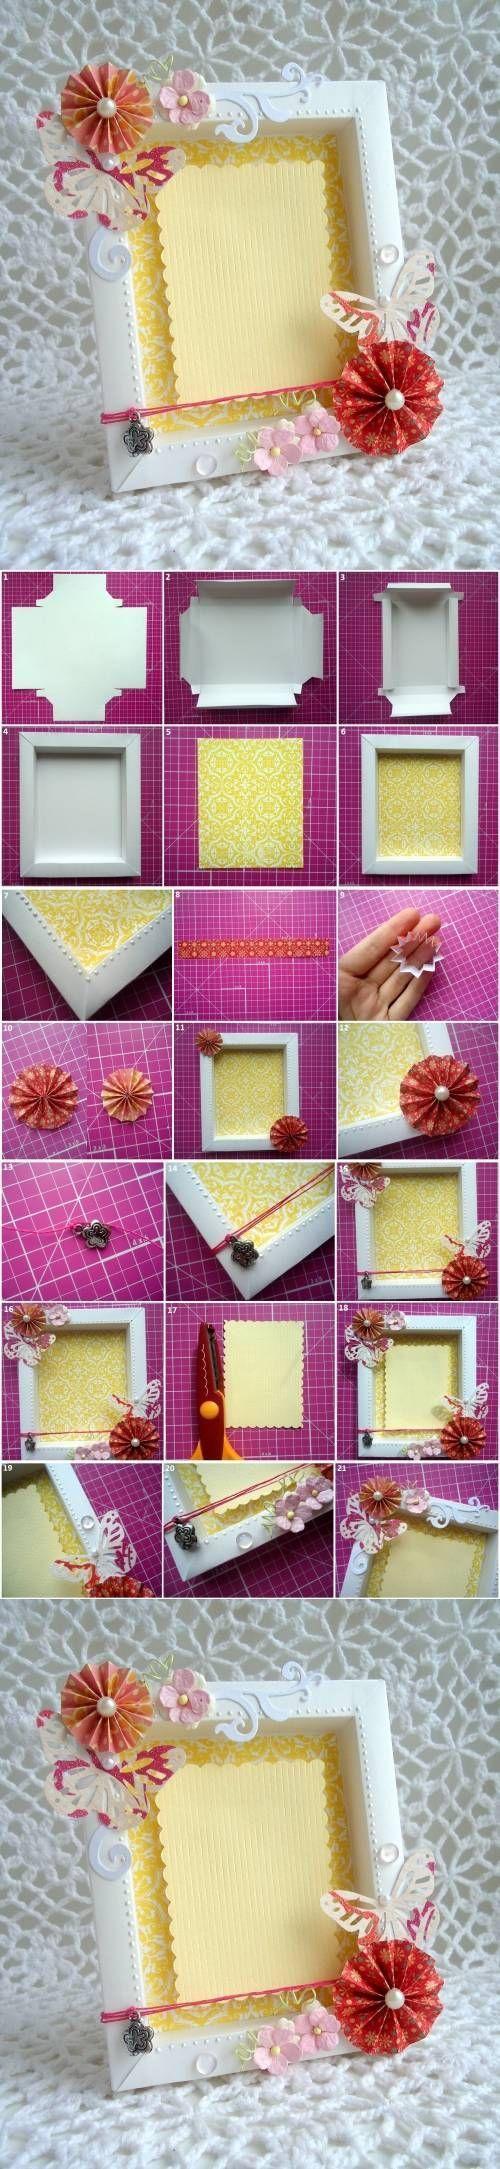 Diy Cute Cardboard Picture Frame Picture Frame Designs Diy